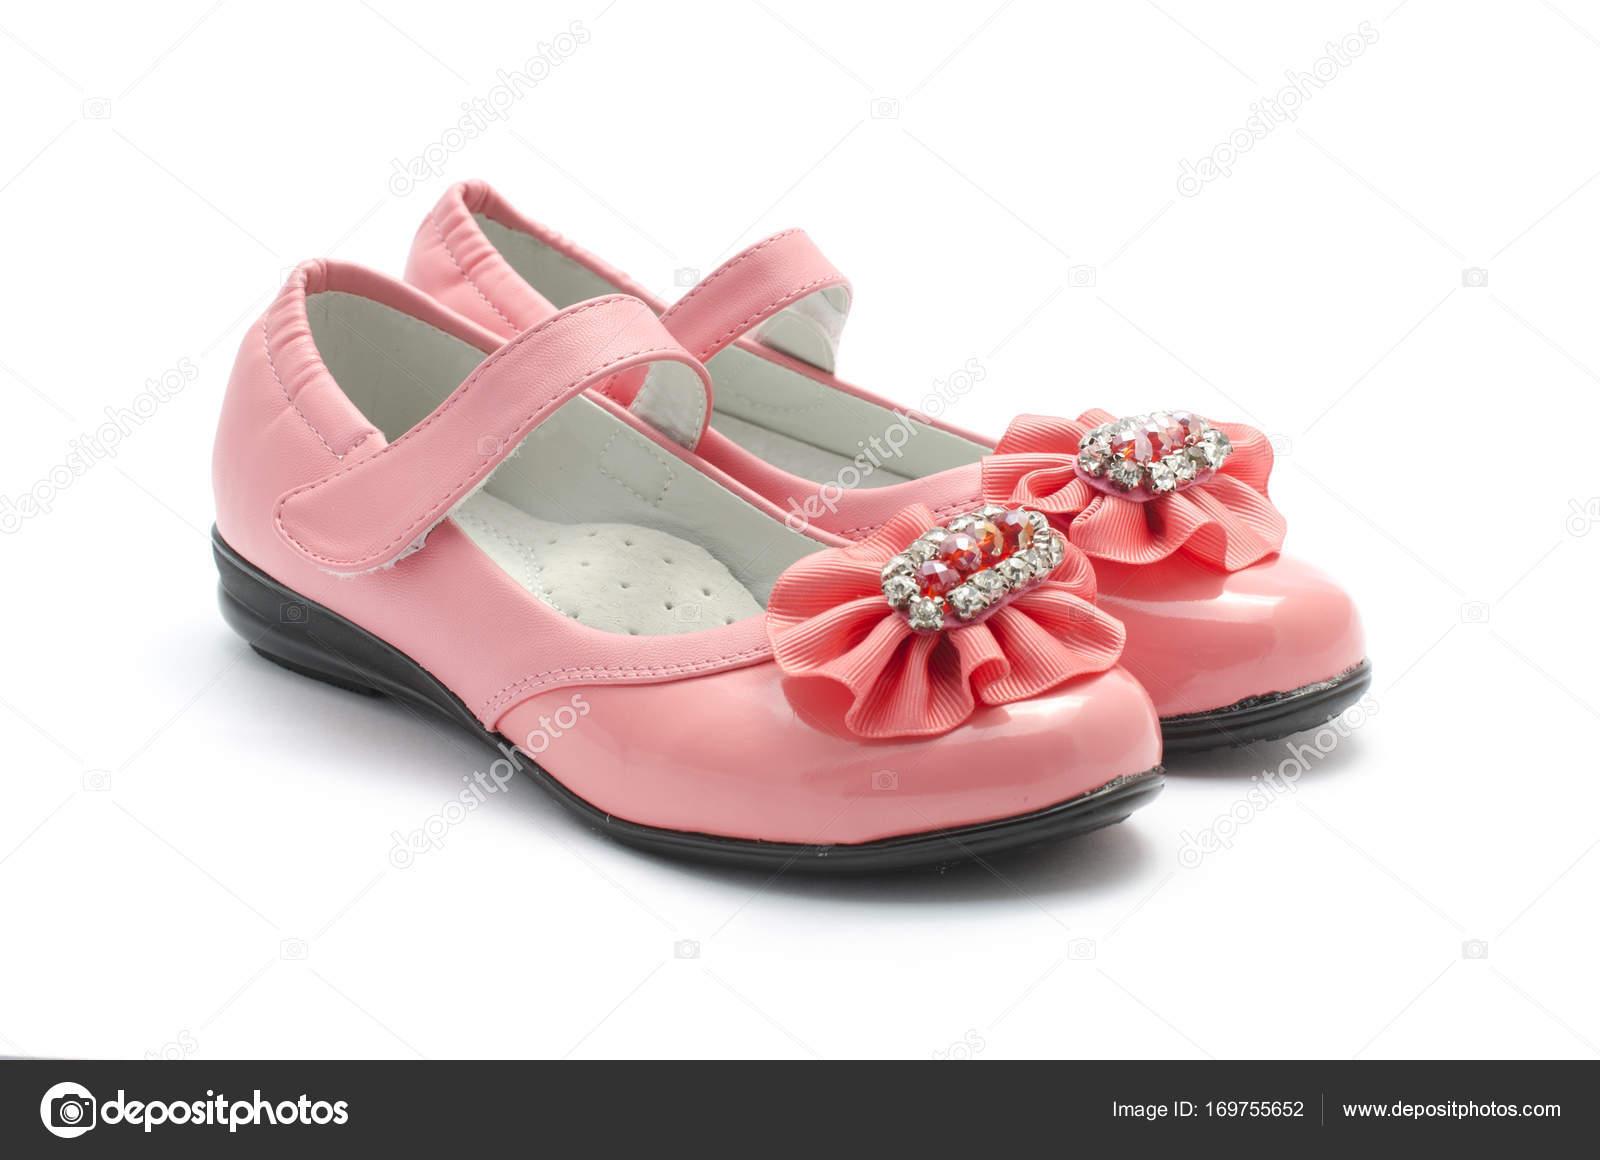 81c68bb1bd5 Παιδιά ροζ παπούτσια που απομονώνονται σε λευκό — Φωτογραφία Αρχείου ...